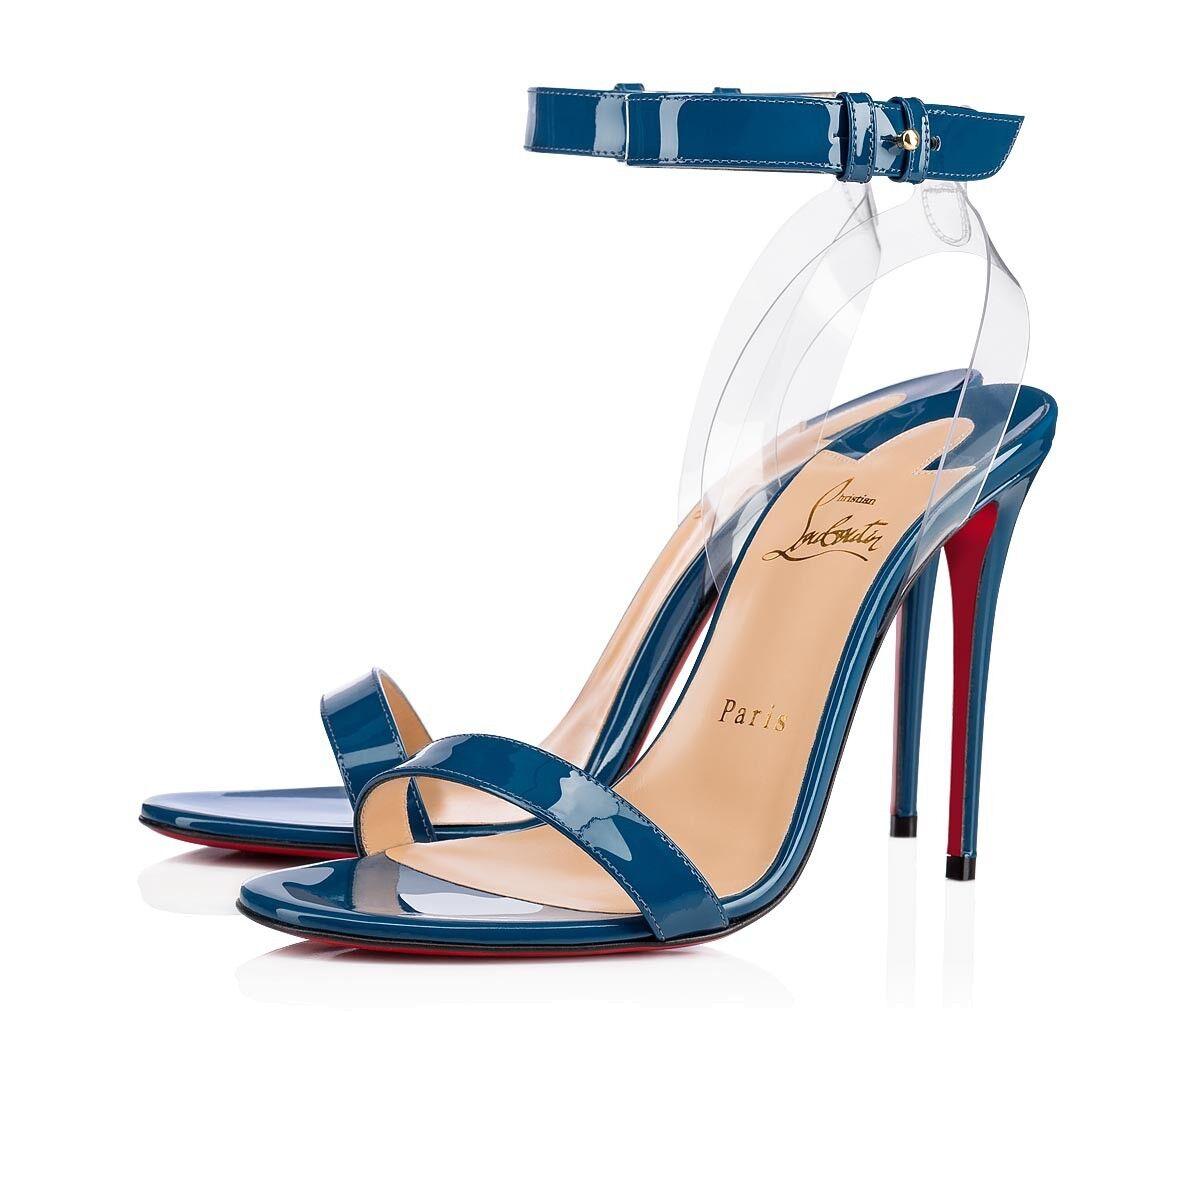 Christian Louboutin Louboutin Louboutin Jonatina 100 bleu Positano Ankle Strap Sandal Heel Pump 41 776fae